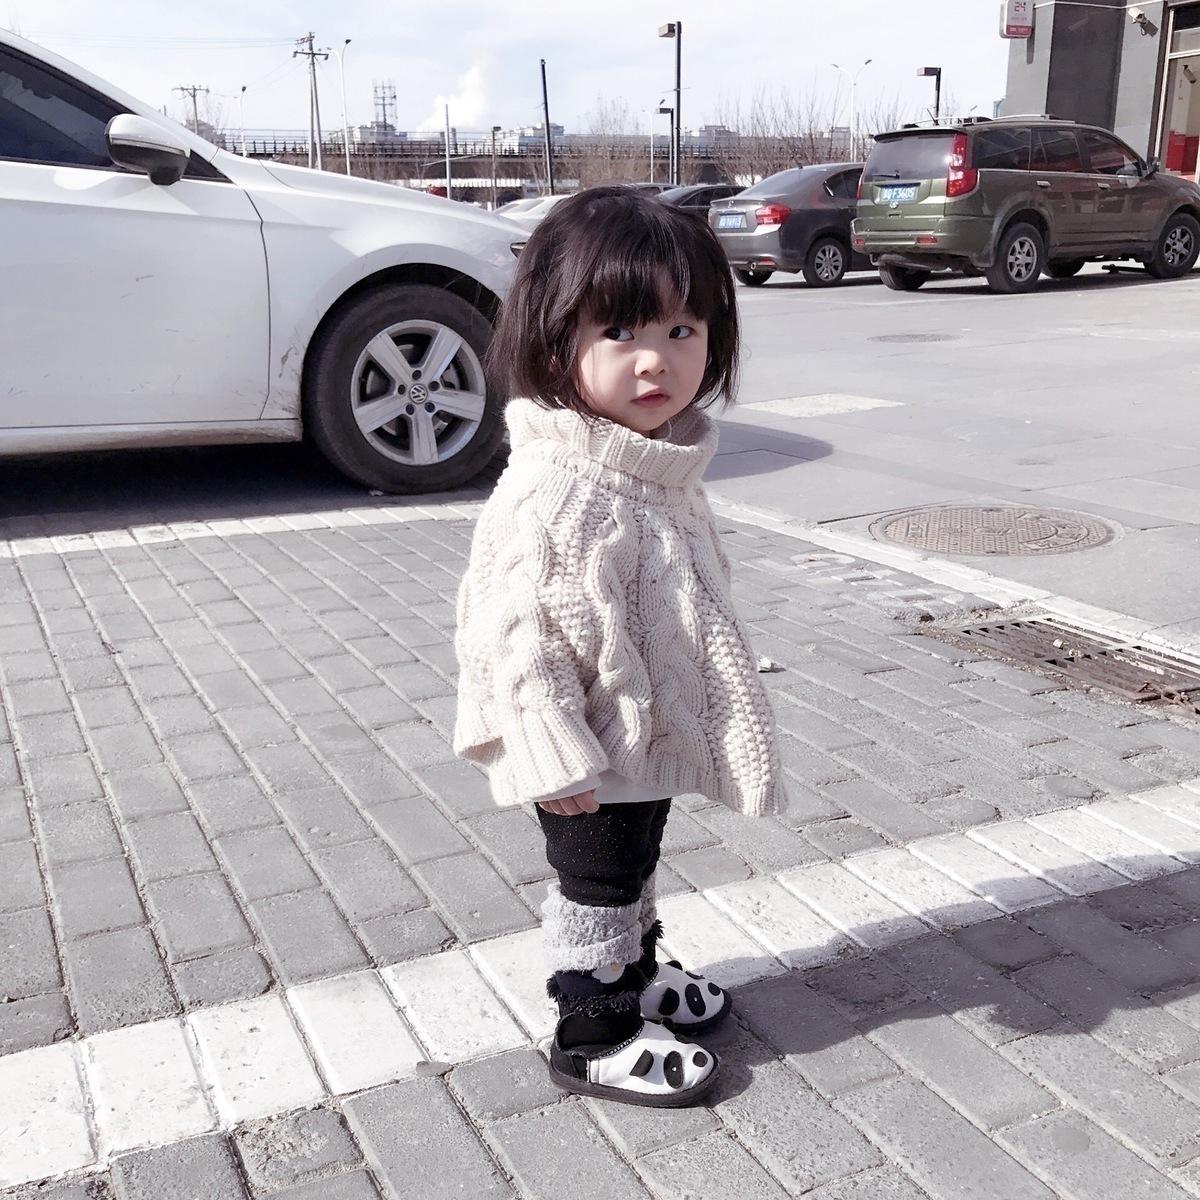 INS爆款童装米色麻花编织毛衣斗篷 女童粗毛线高端毛衣斗篷中小童